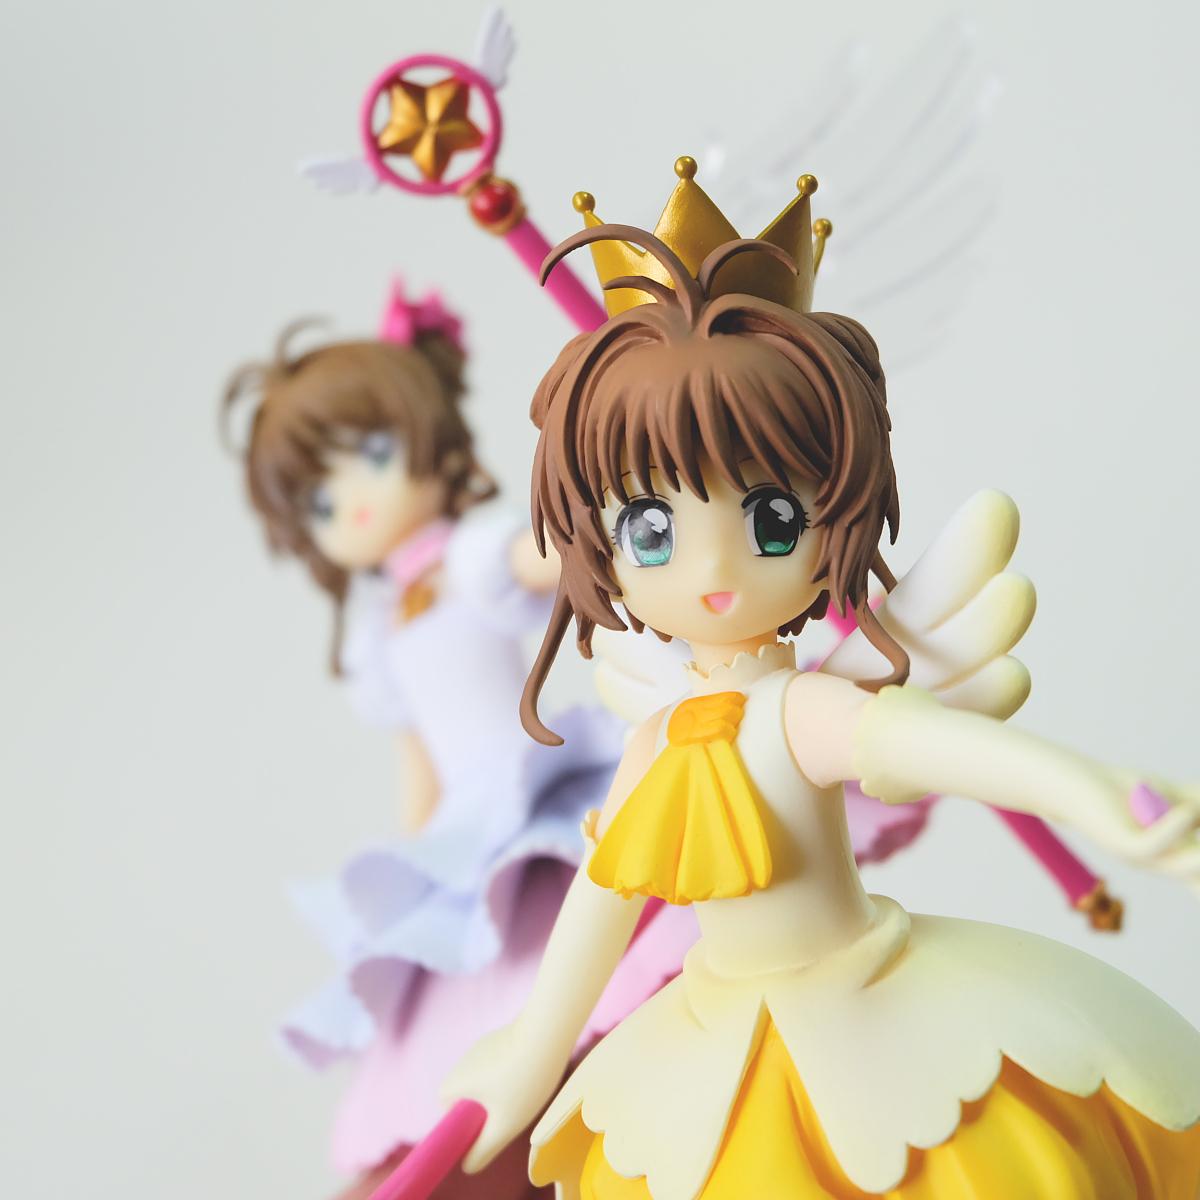 DSCF3341 kawaii cardcaptor sakura toys rainbowholic shop